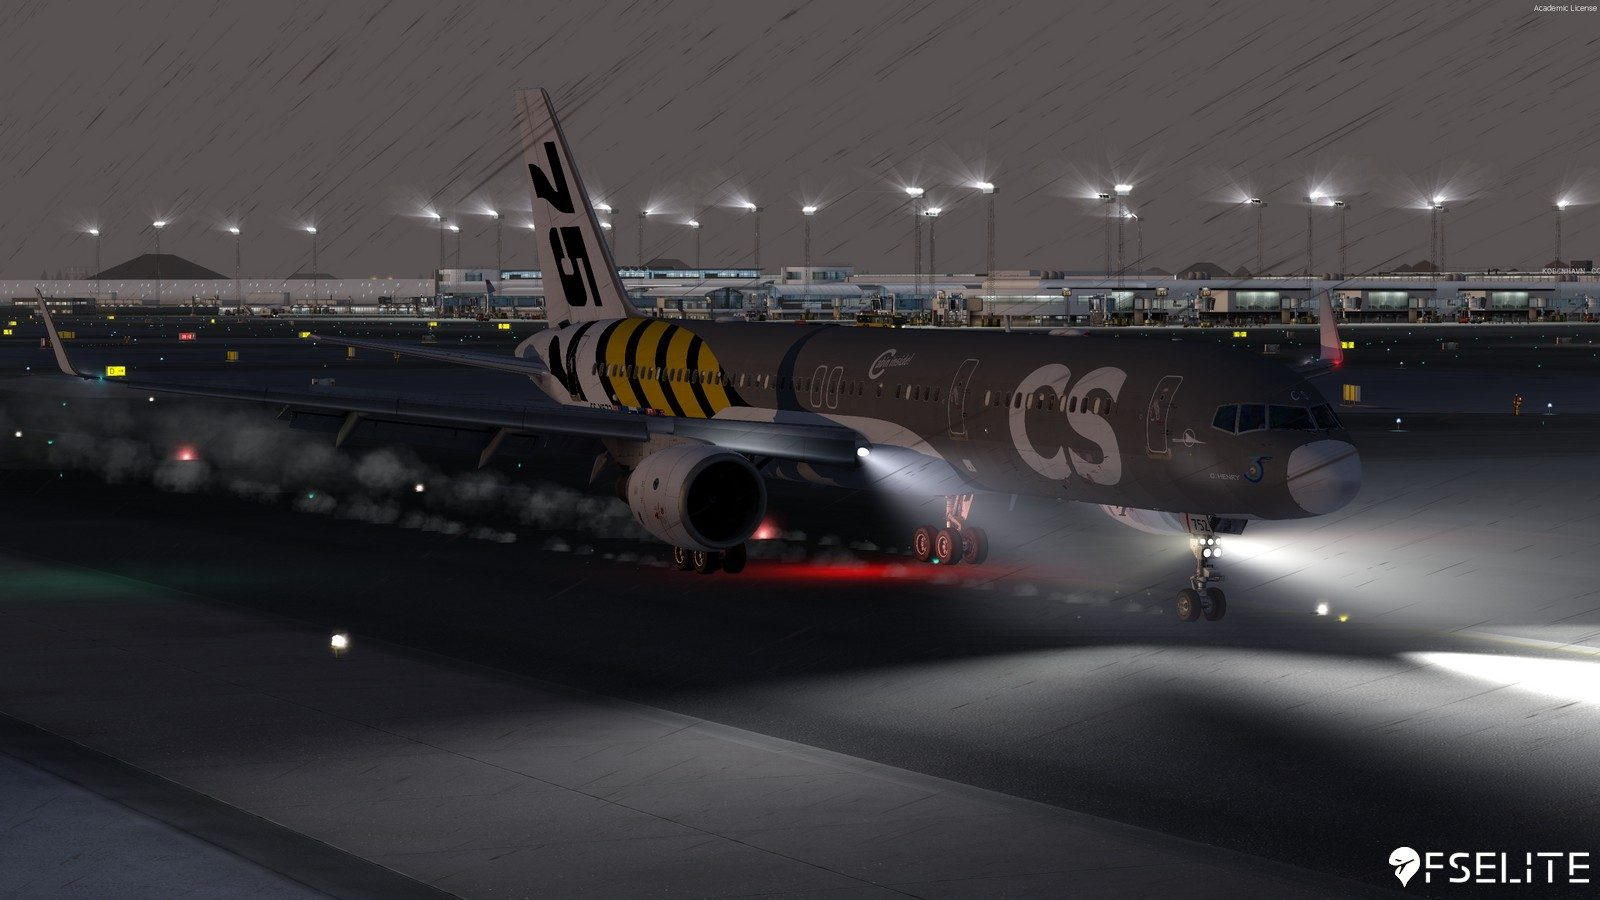 P3Dv4] CaptainSim 757 III Base Pack ~ ᴍᴇɢᴀᴅᴅᴏɴs ®